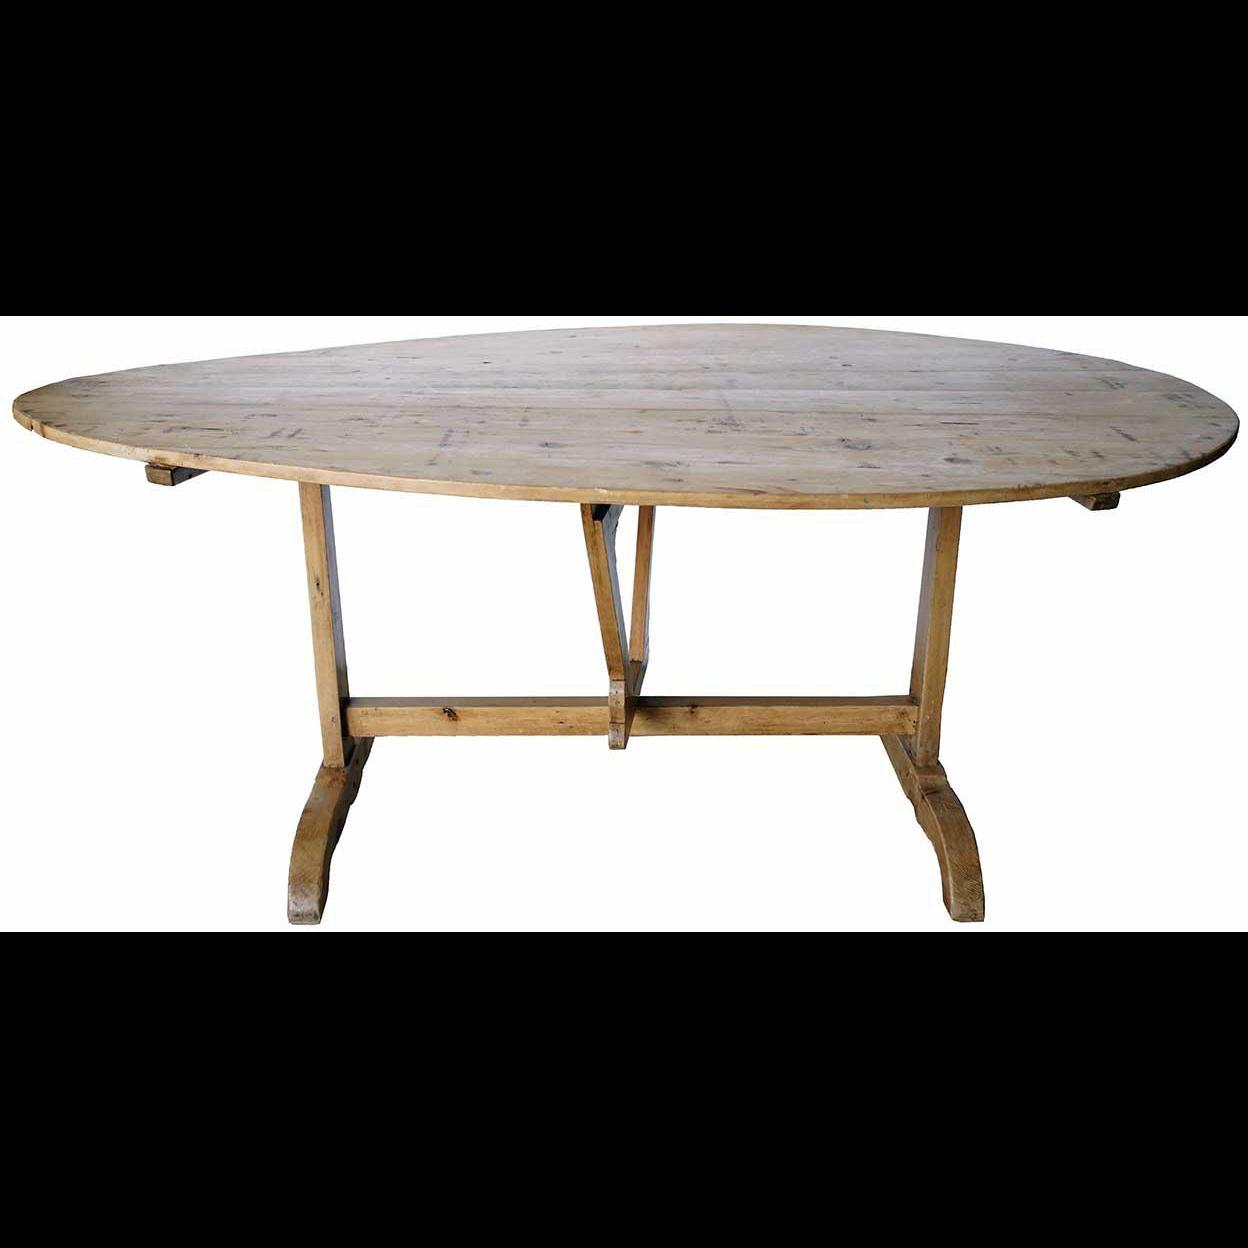 Large French Provincial Pine Trestle Tilt-Top Oval Wine Tasting (Vendage) Table